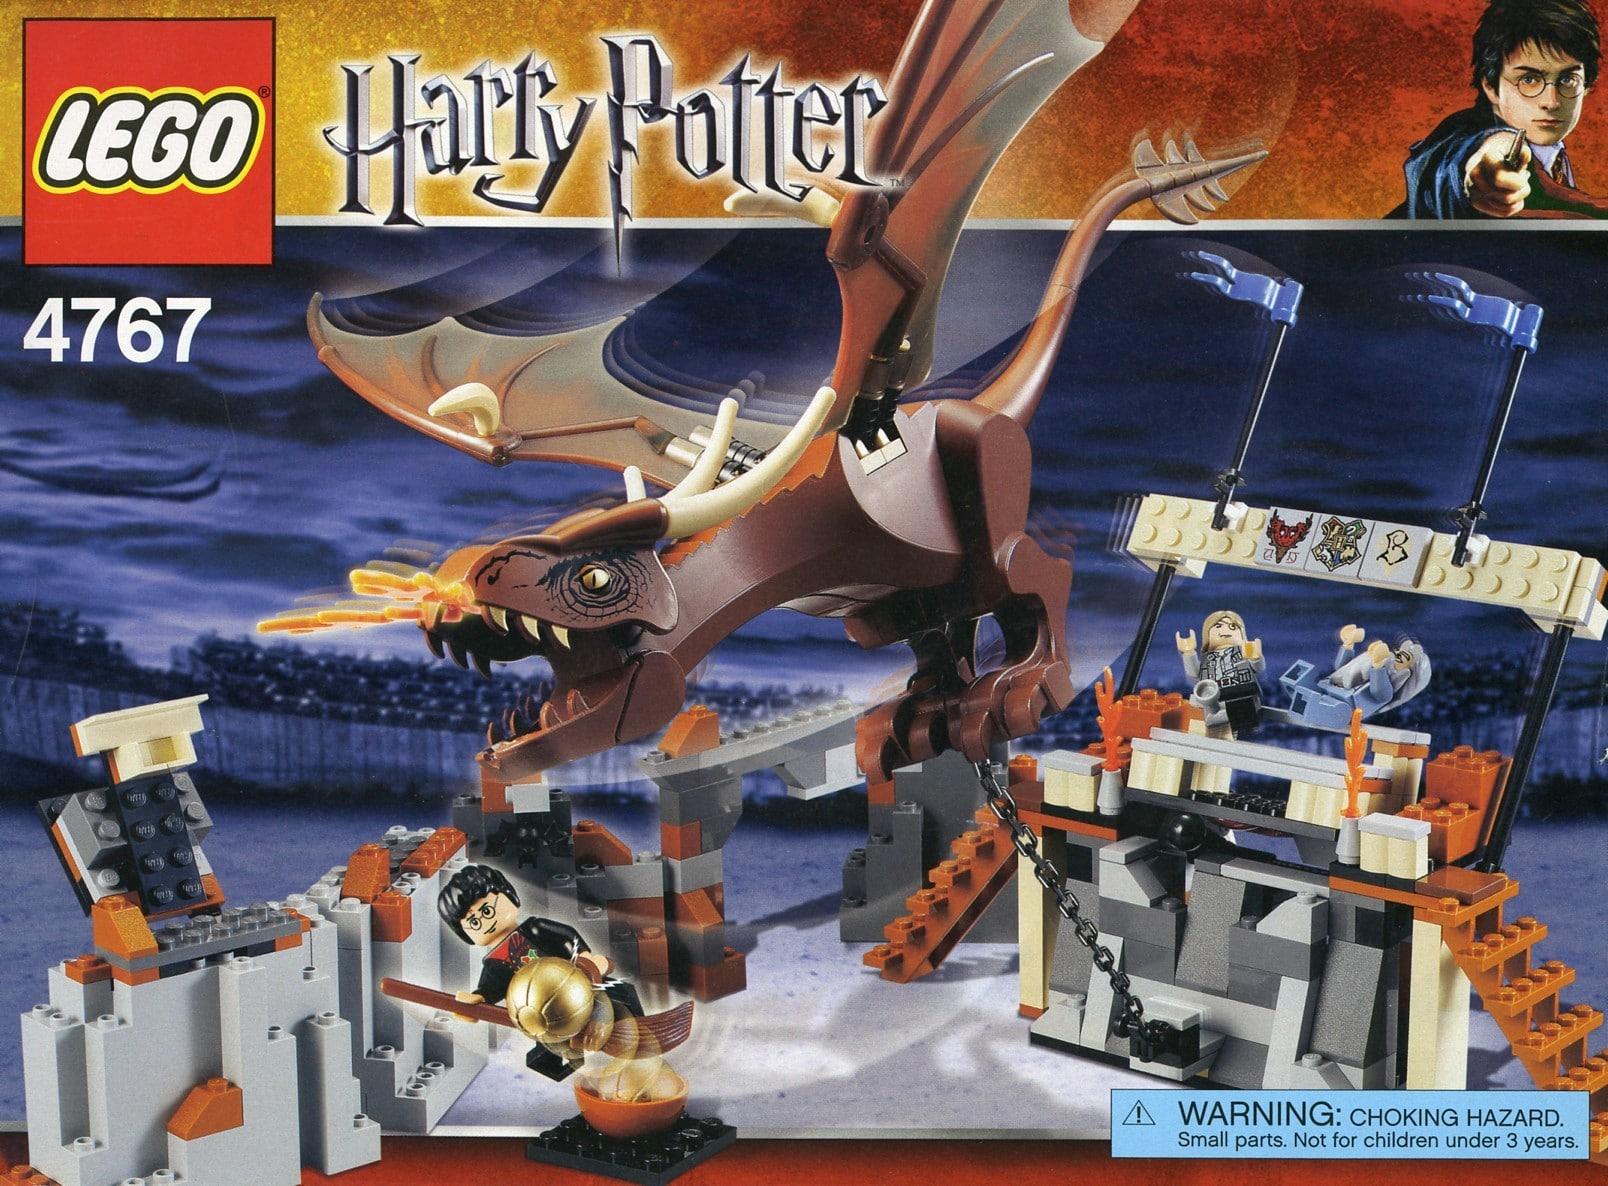 LEGO Harry Potter 4767